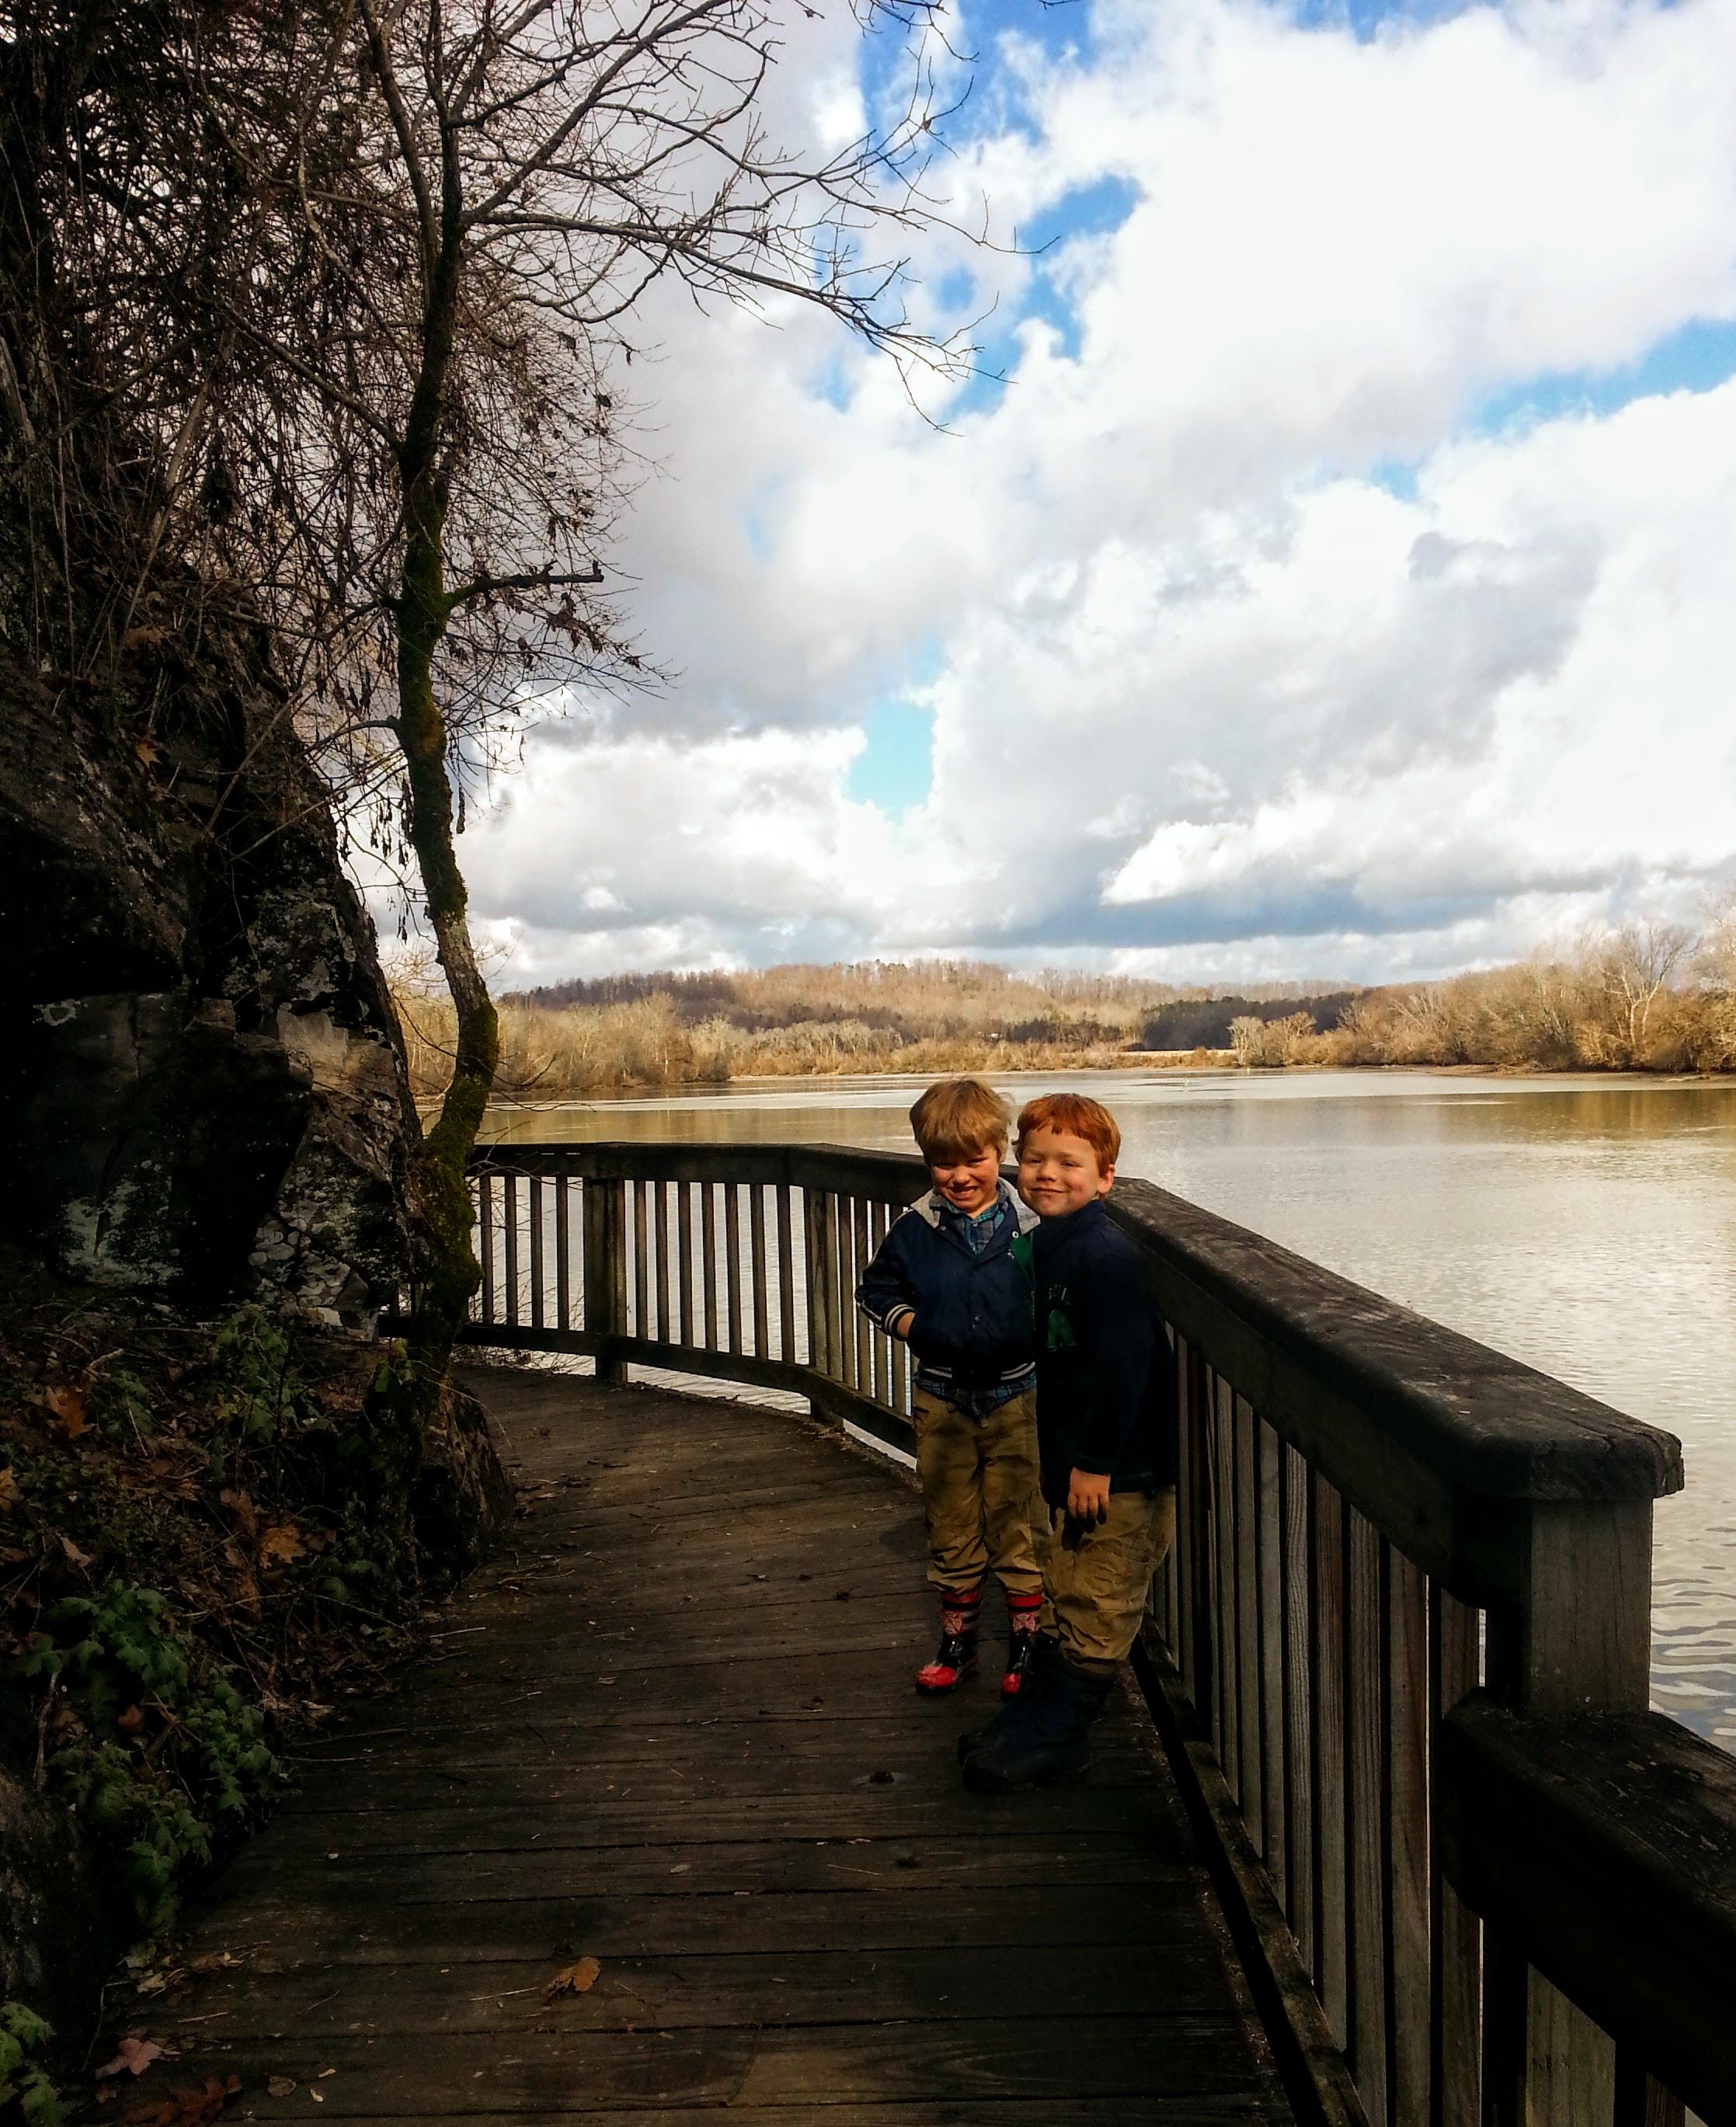 Boardwalk on the River Trail